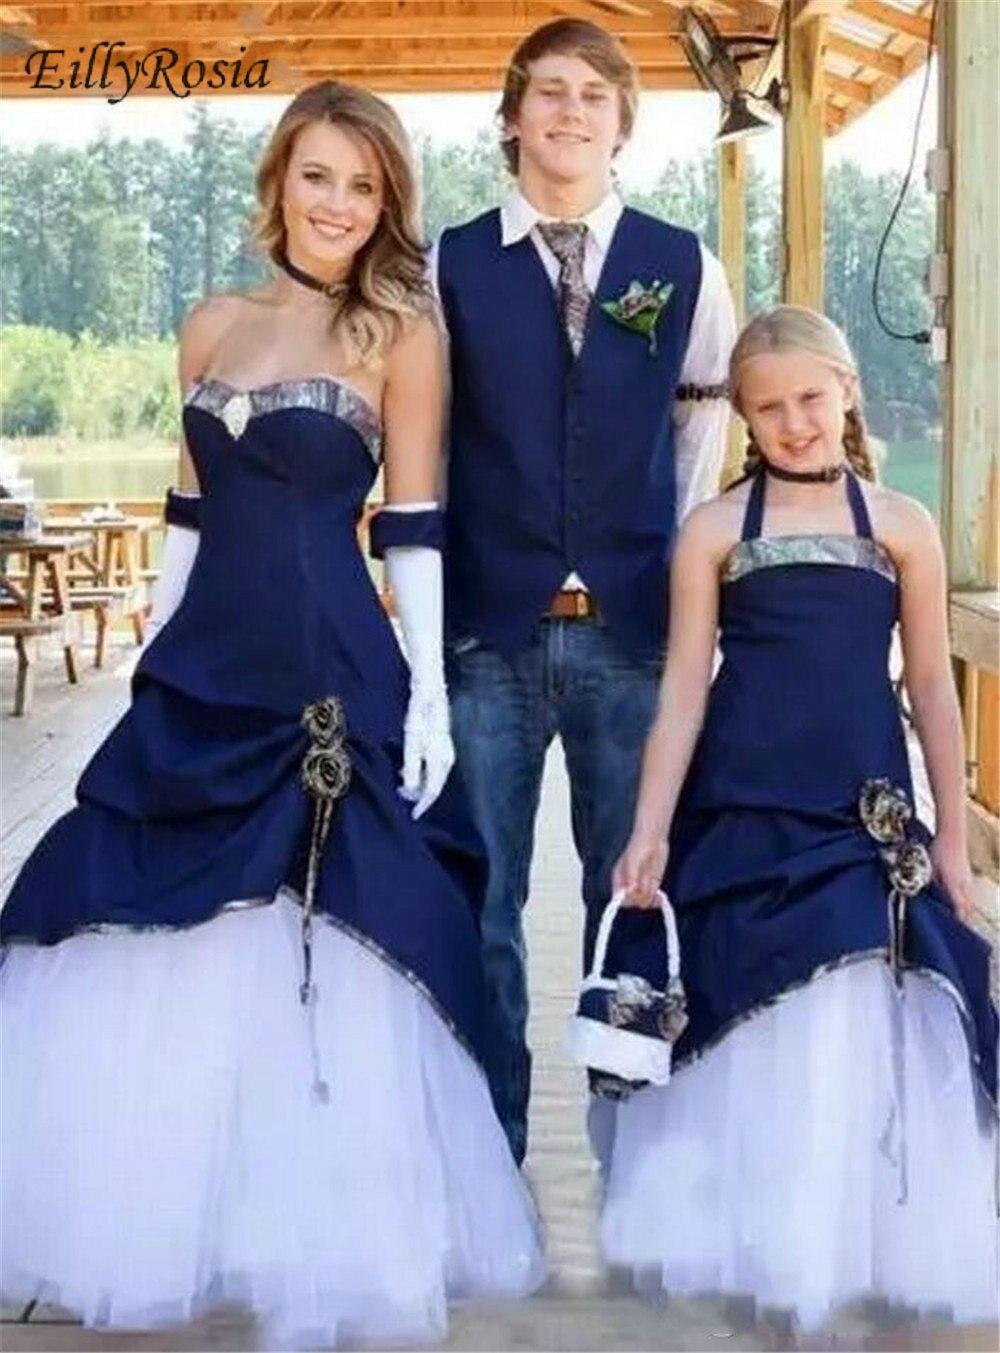 Unique Design Camo Wedding Dresses Navy Blue Satin White Tulle Trumpet Denim Wedding Dresses Camo Wedding Dresses Denim Wedding [ 1353 x 1000 Pixel ]